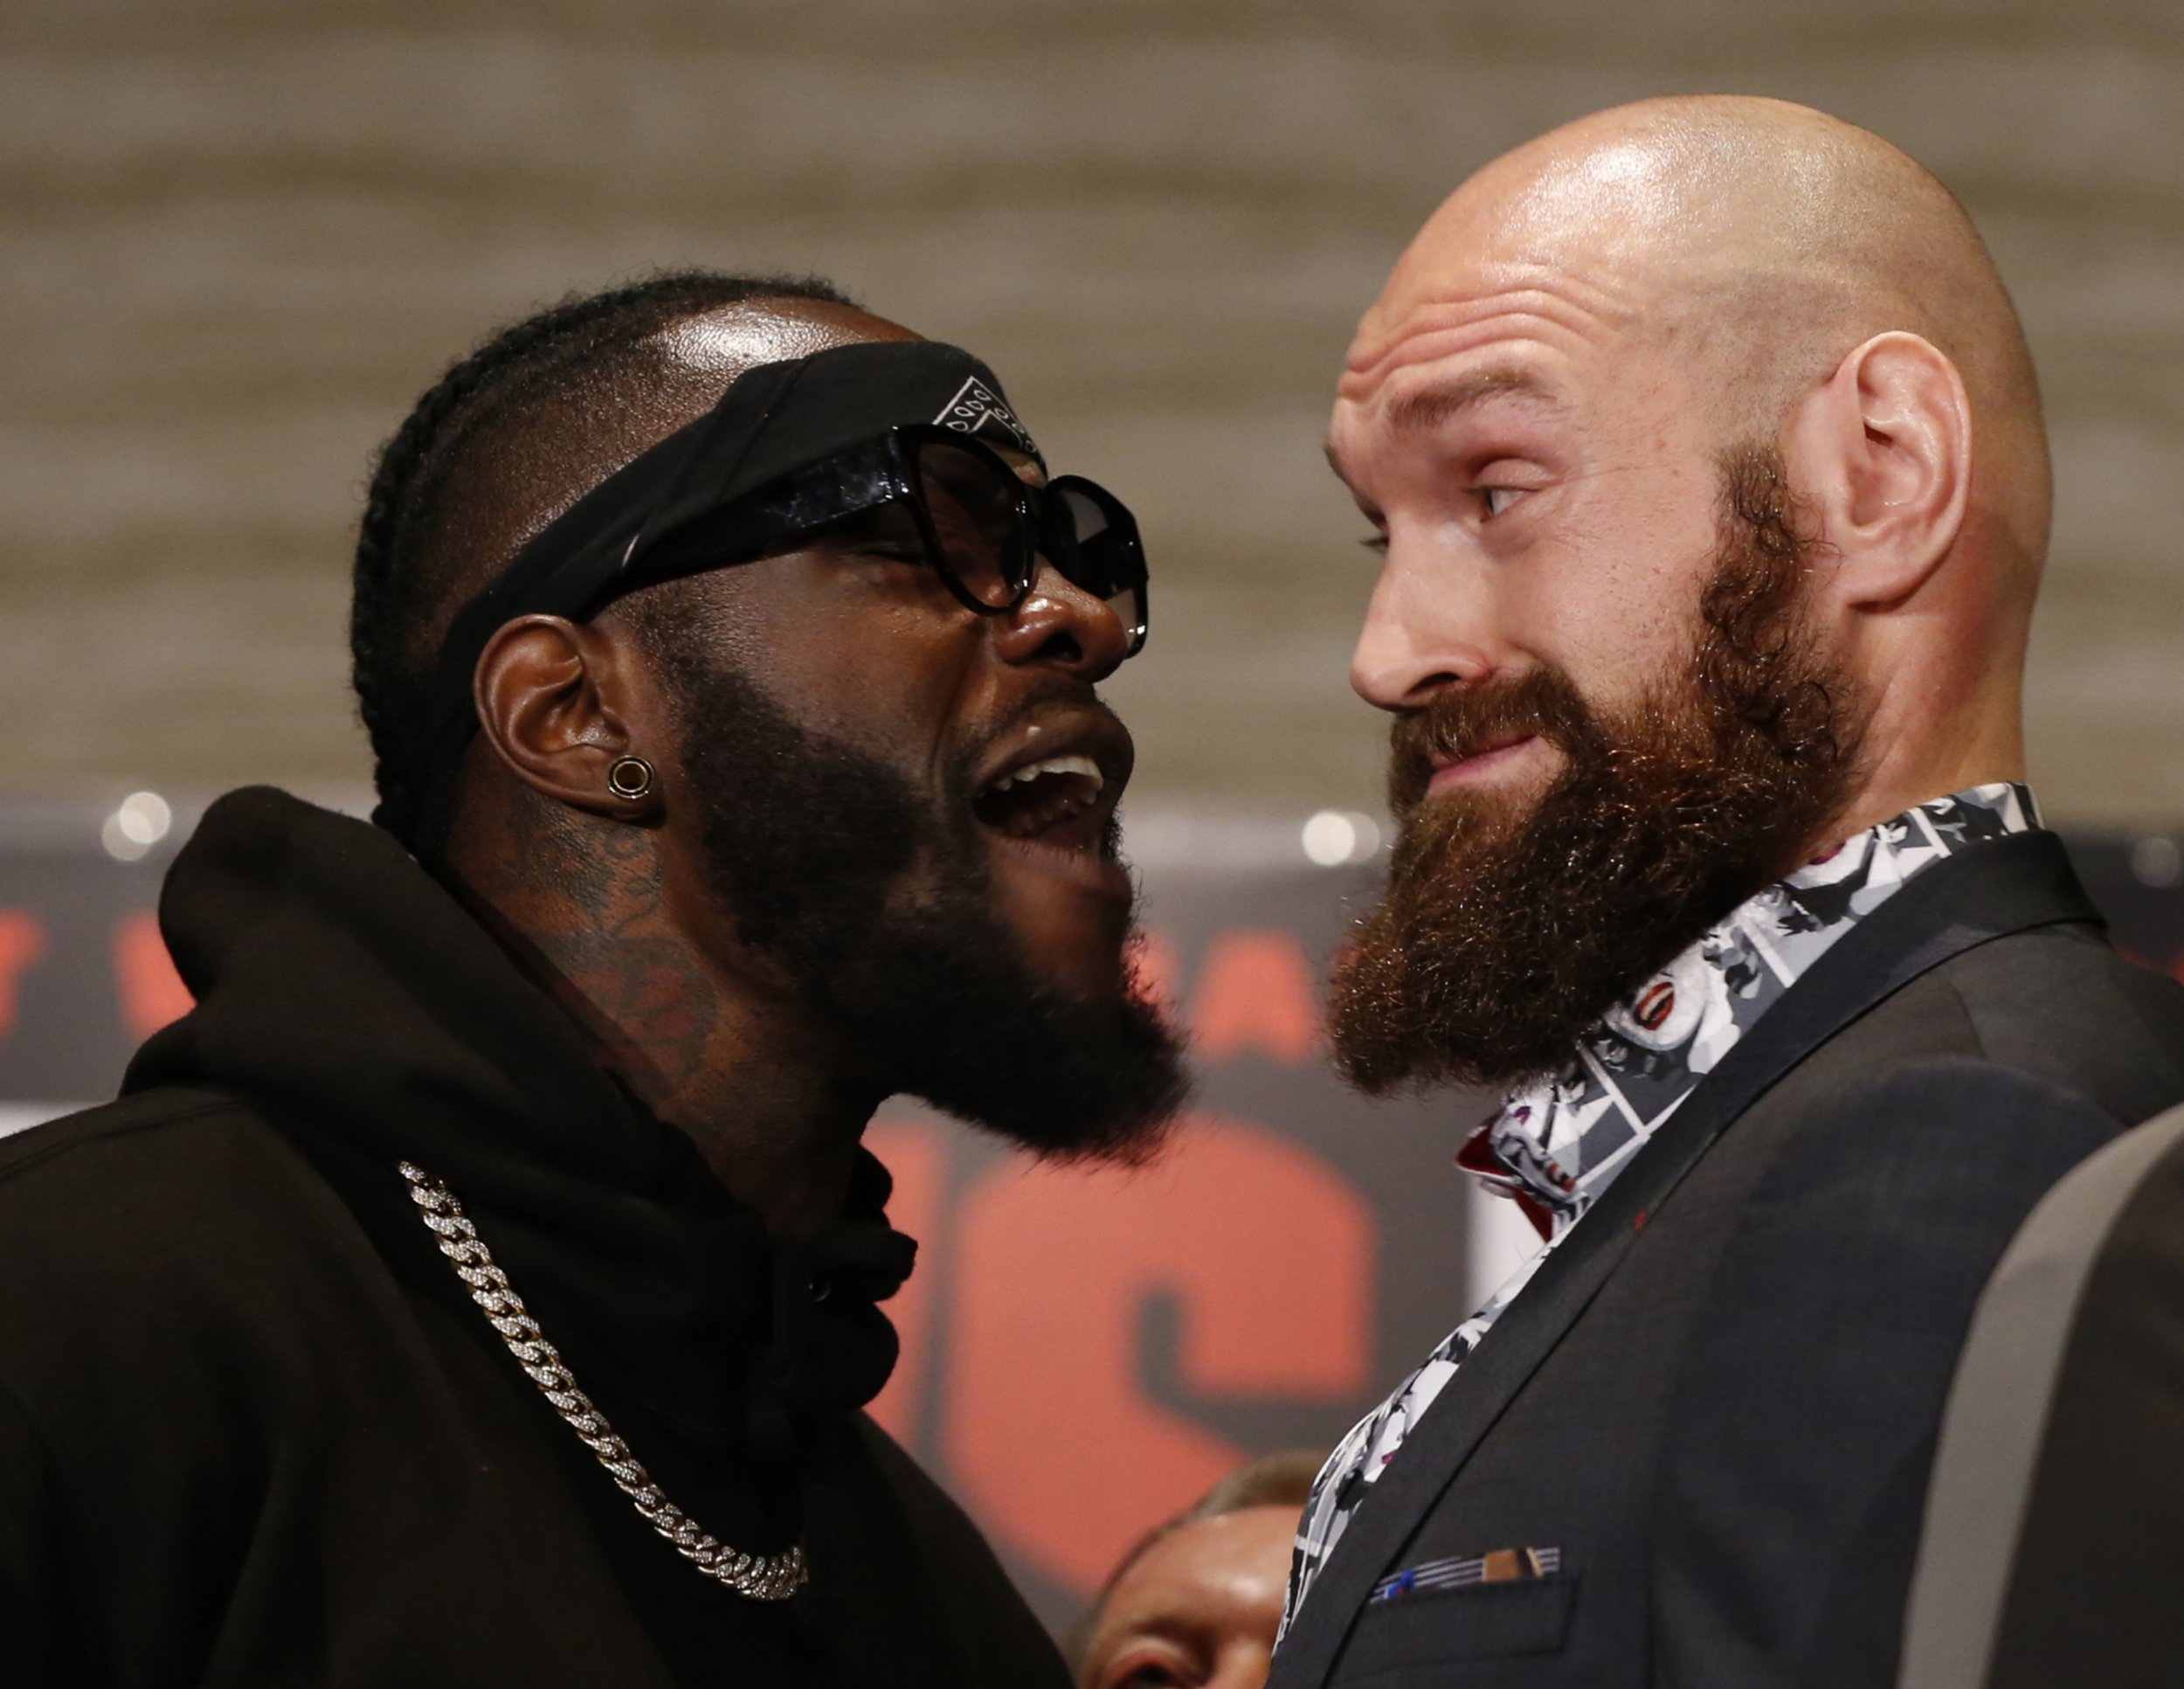 Deontay Wilder vs Tyson Fury Predictions: Anthony Joshua, Mike Tyson & Frank Warren cast their bets